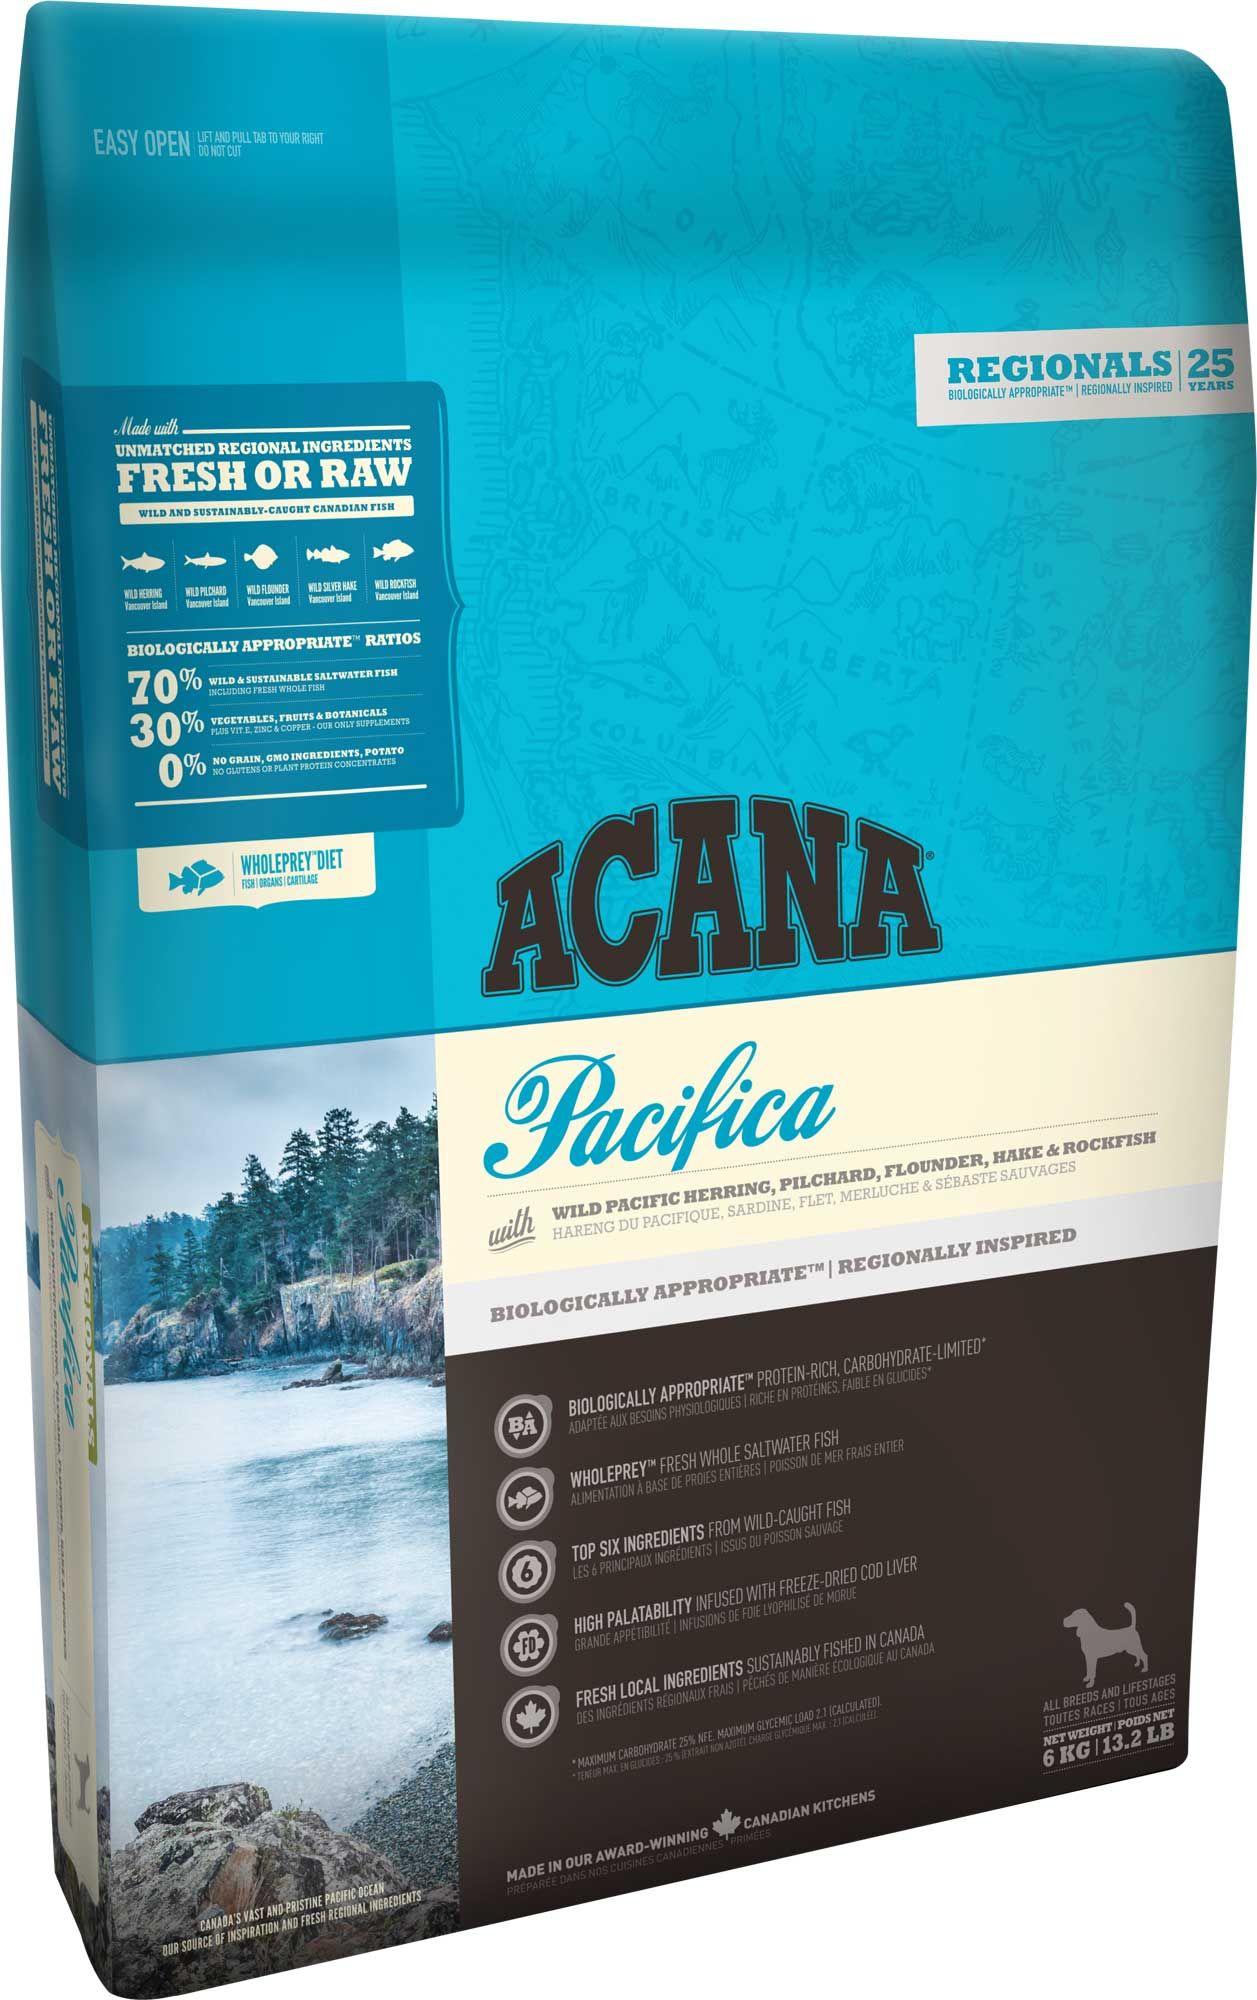 Pacifica Acana Pet Foods Dog Food Recipes Dry Dog Food Dog